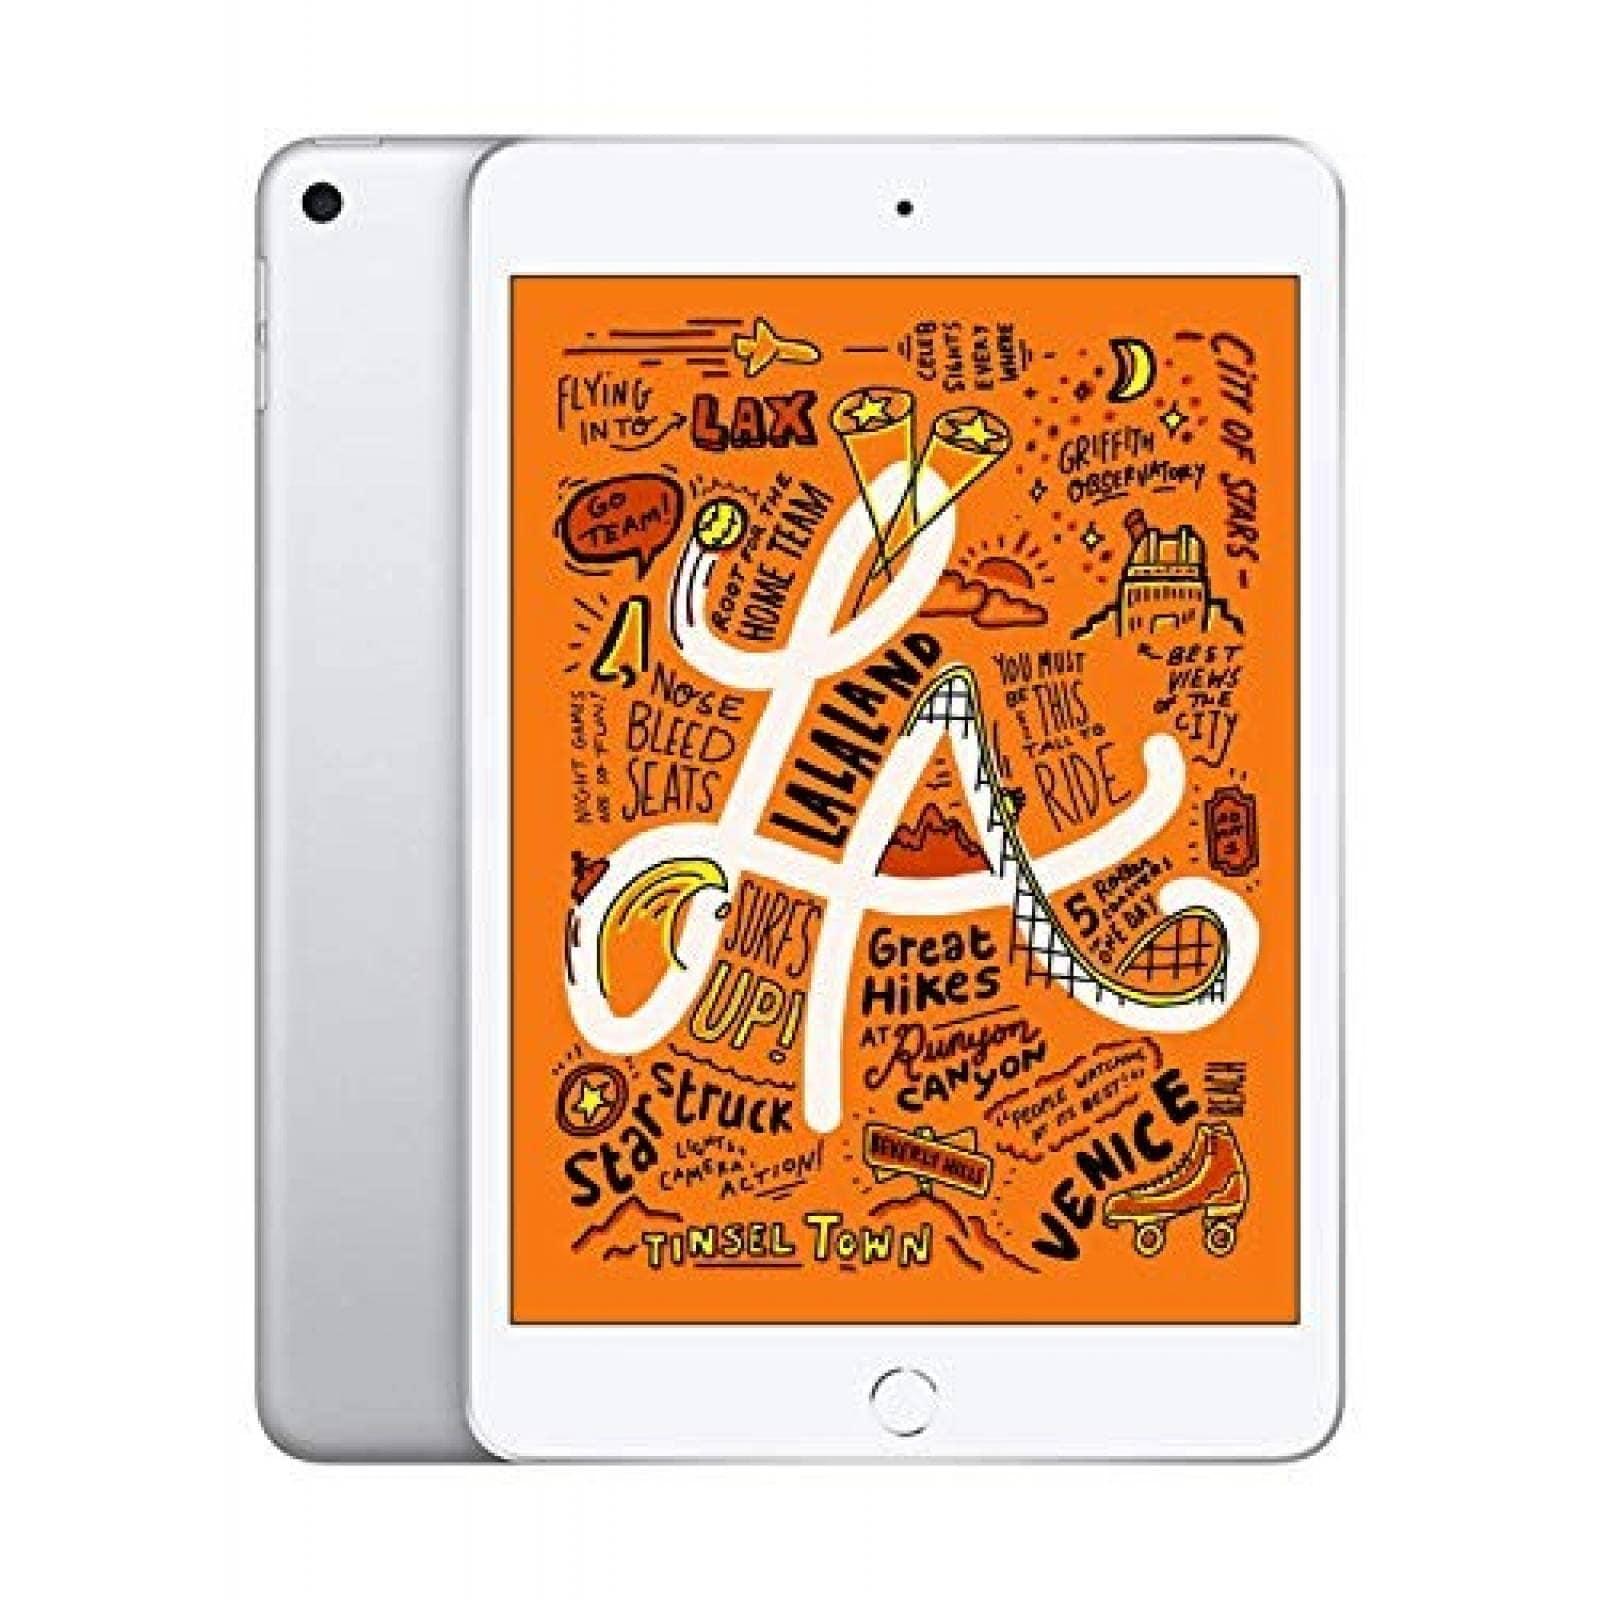 iPad Apple Mini 7.9'' 64GB Wifi 802.11ac 10hrs -Plateado